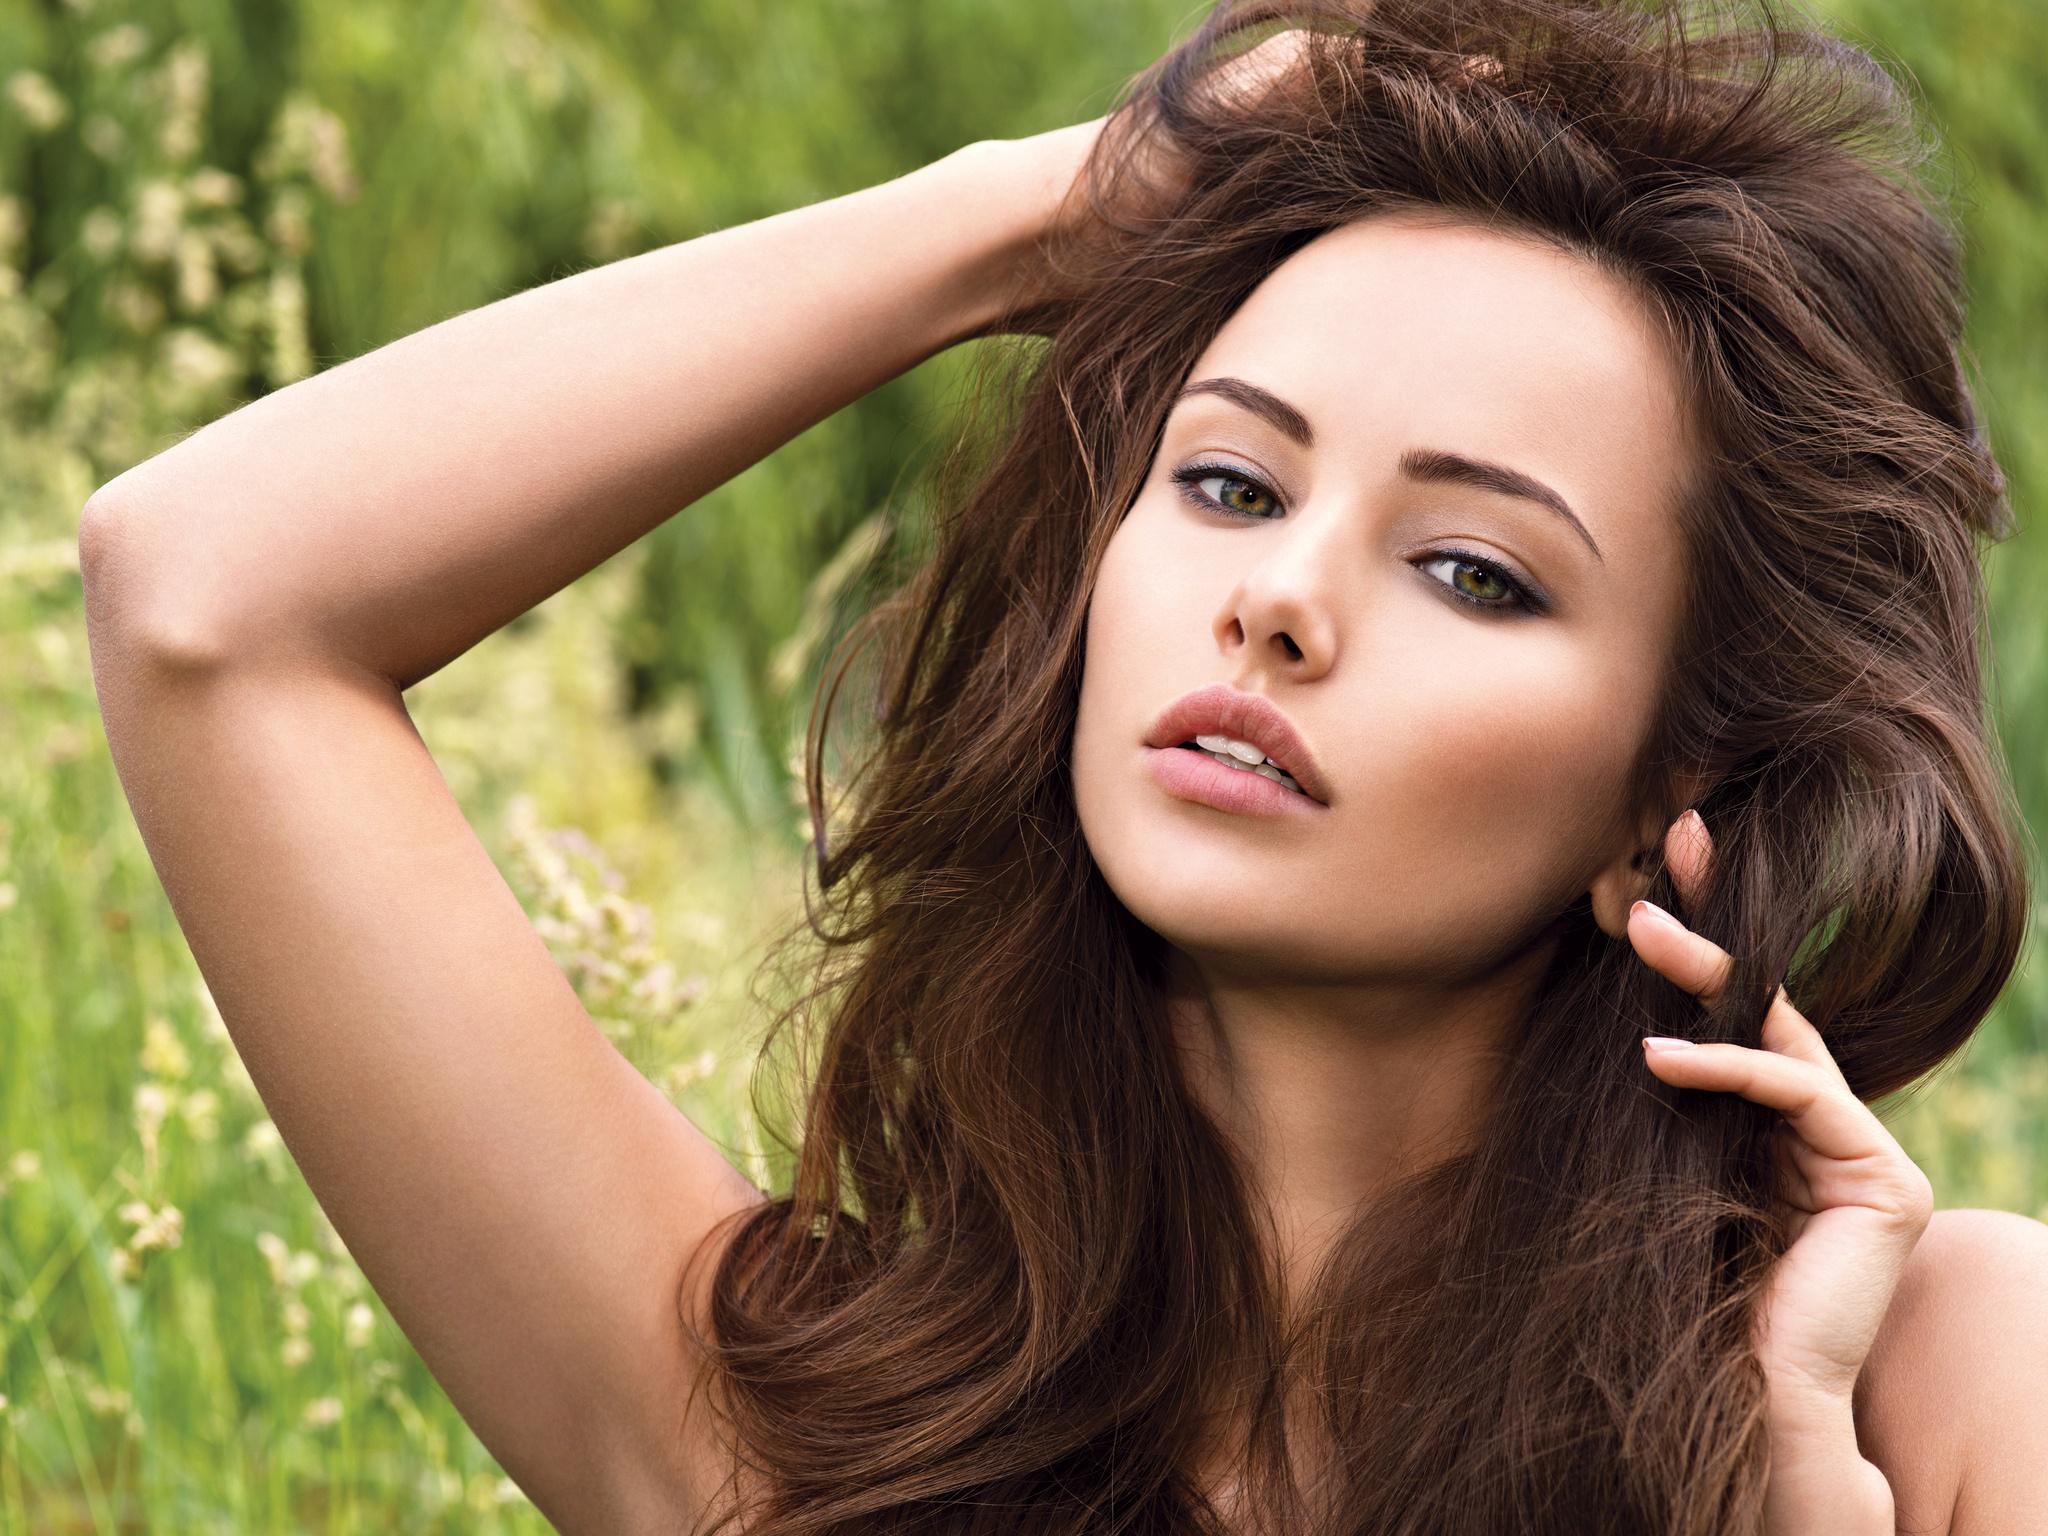 Порно красоток сауна онлайн целки, фотографии